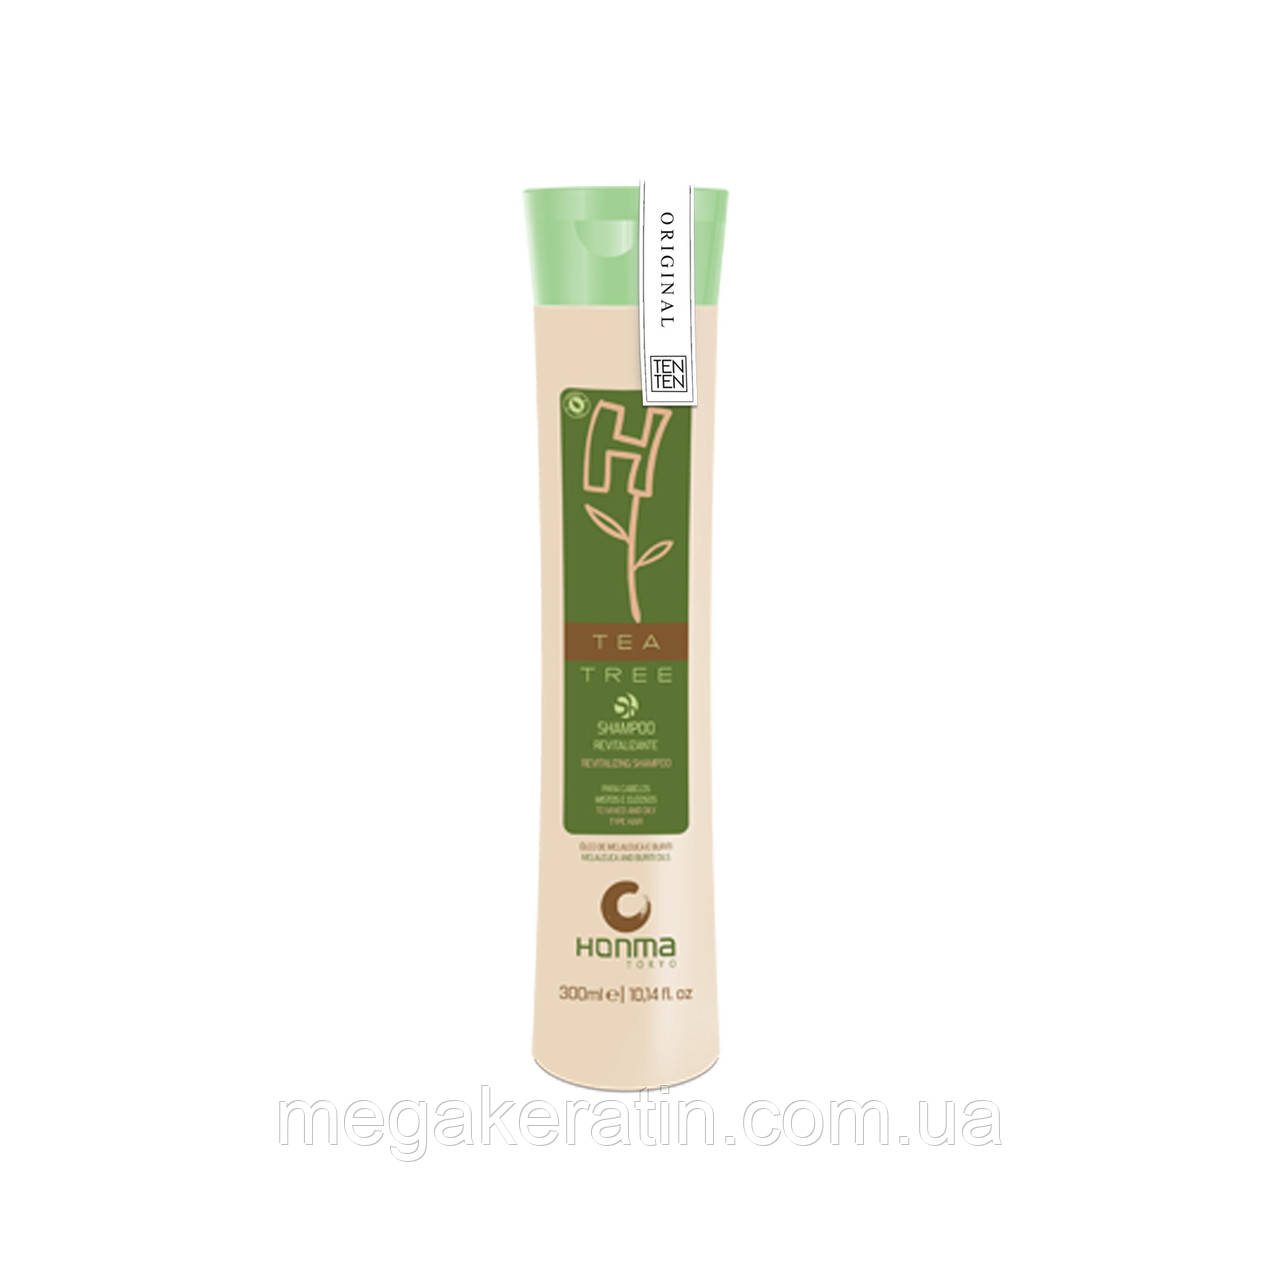 Shampoo H-TEA TREE — Ревитализирующий шампунь Чайное дерево / 300 ml. Honma Tokyo